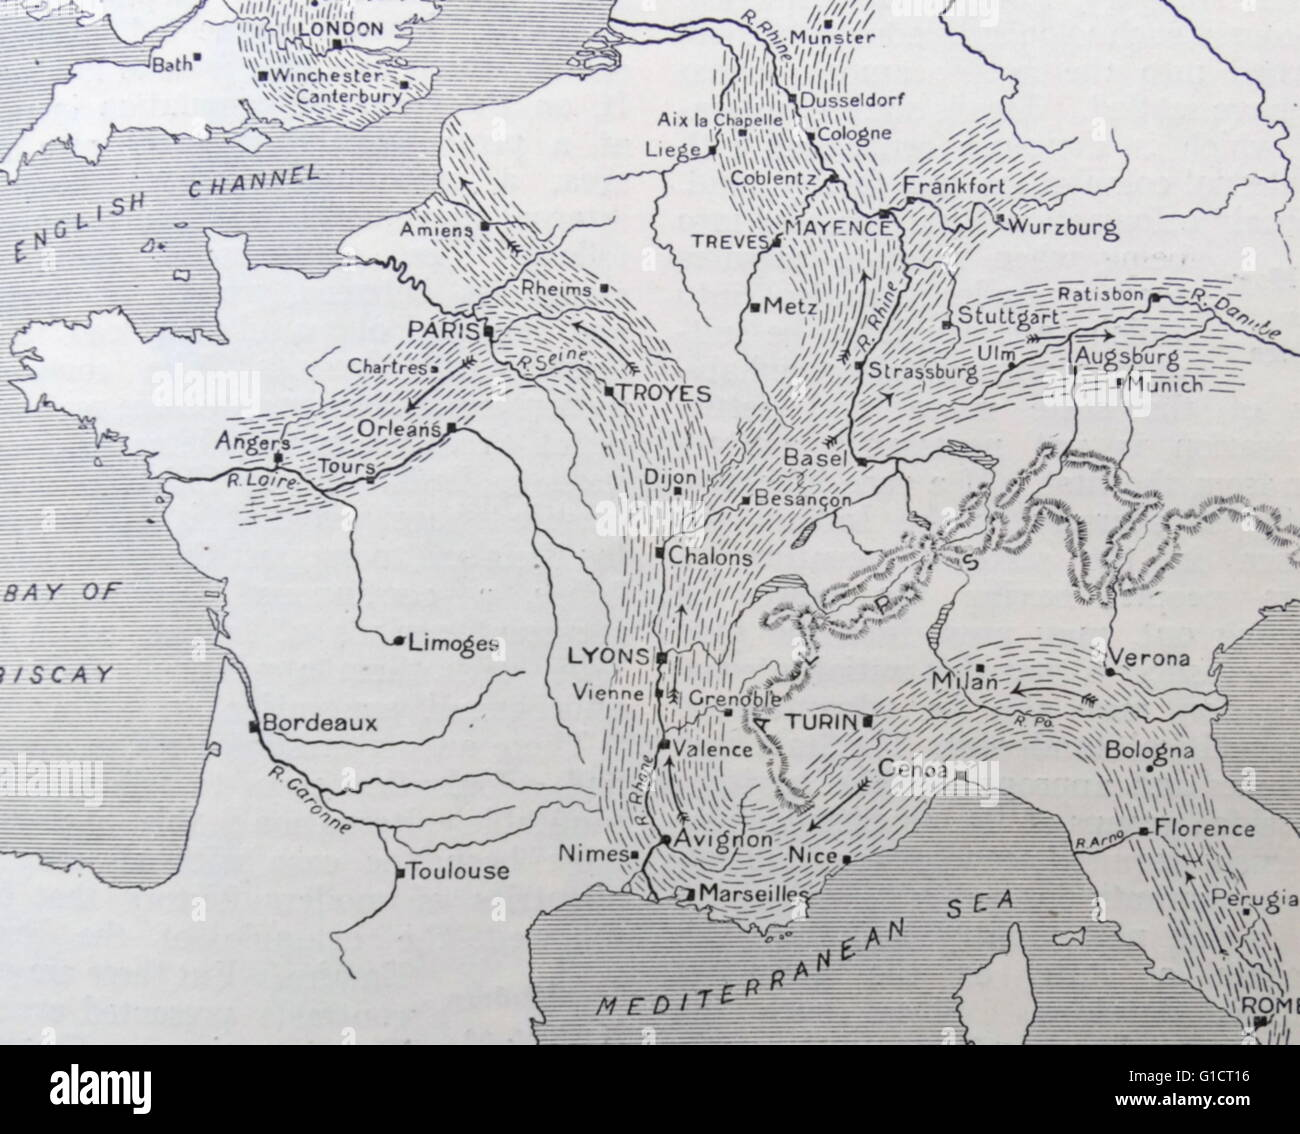 Europe 19th Century Map Stock Photos Europe 19th Century Map Stock